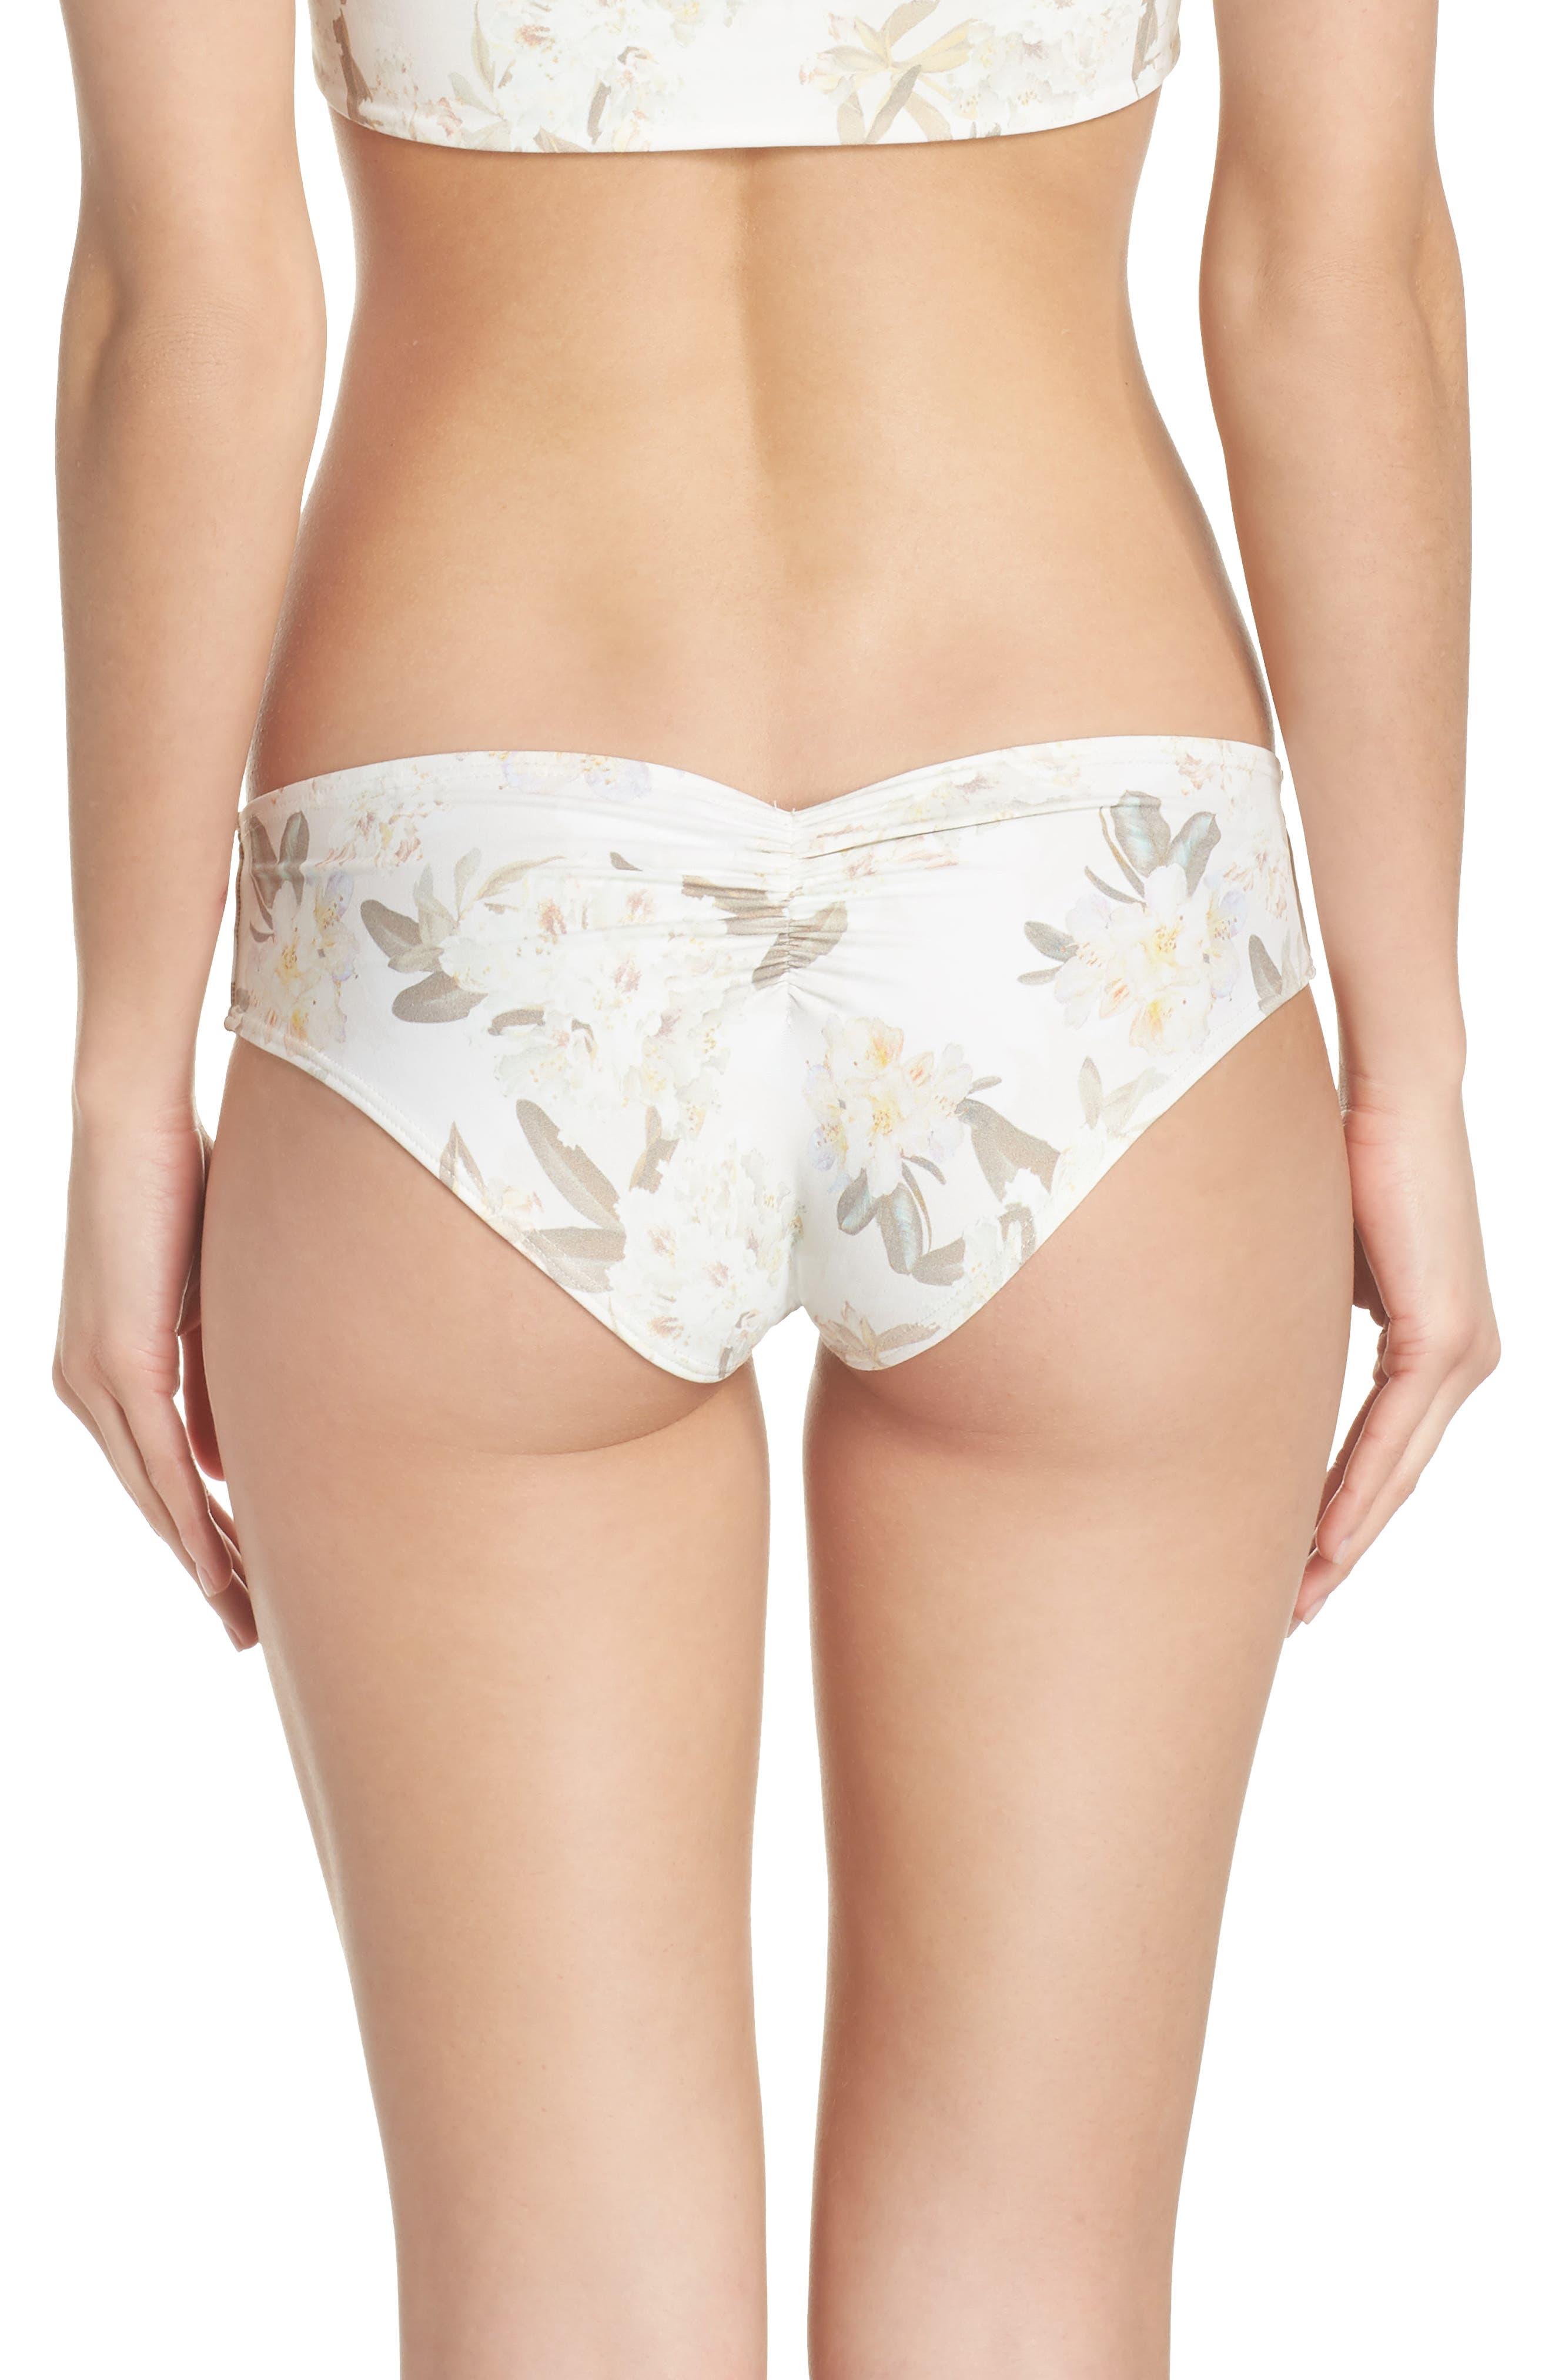 AC Nu Micro Bikini Bottoms,                             Alternate thumbnail 2, color,                             Ete Floral White